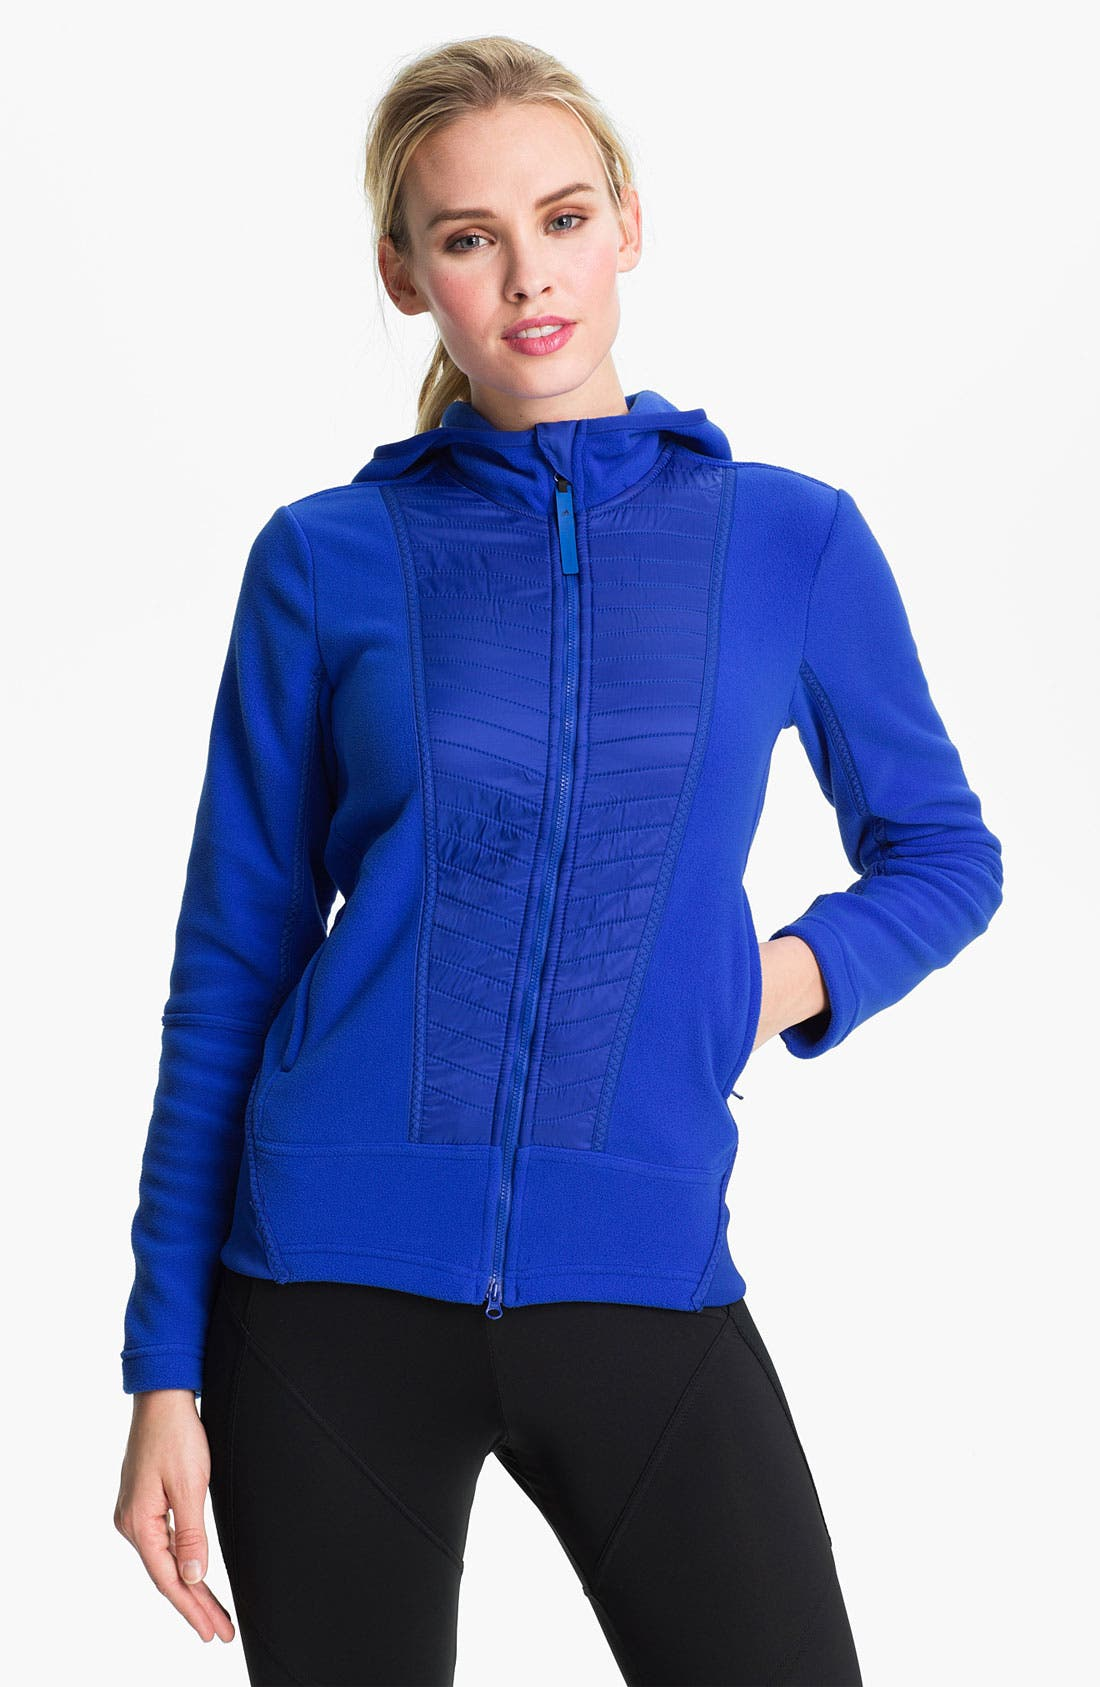 Alternate Image 1 Selected - adidas by Stella McCartney 'Wintersports' Performance Fleece Jacket